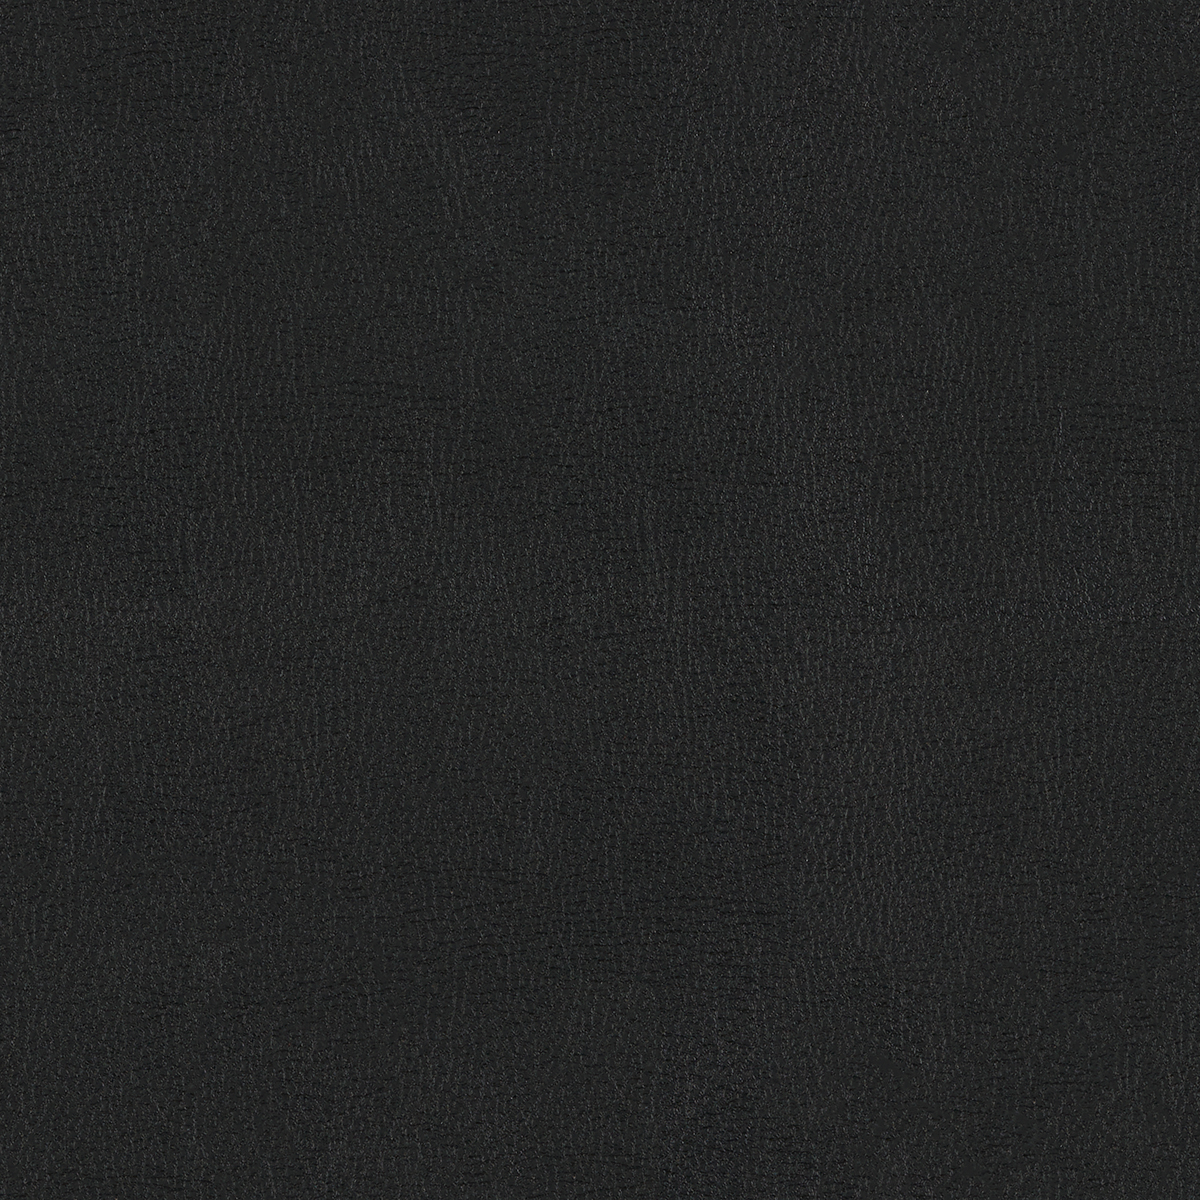 Top Coat - Black Oxide - 4083 - 18 Tileable Swatches